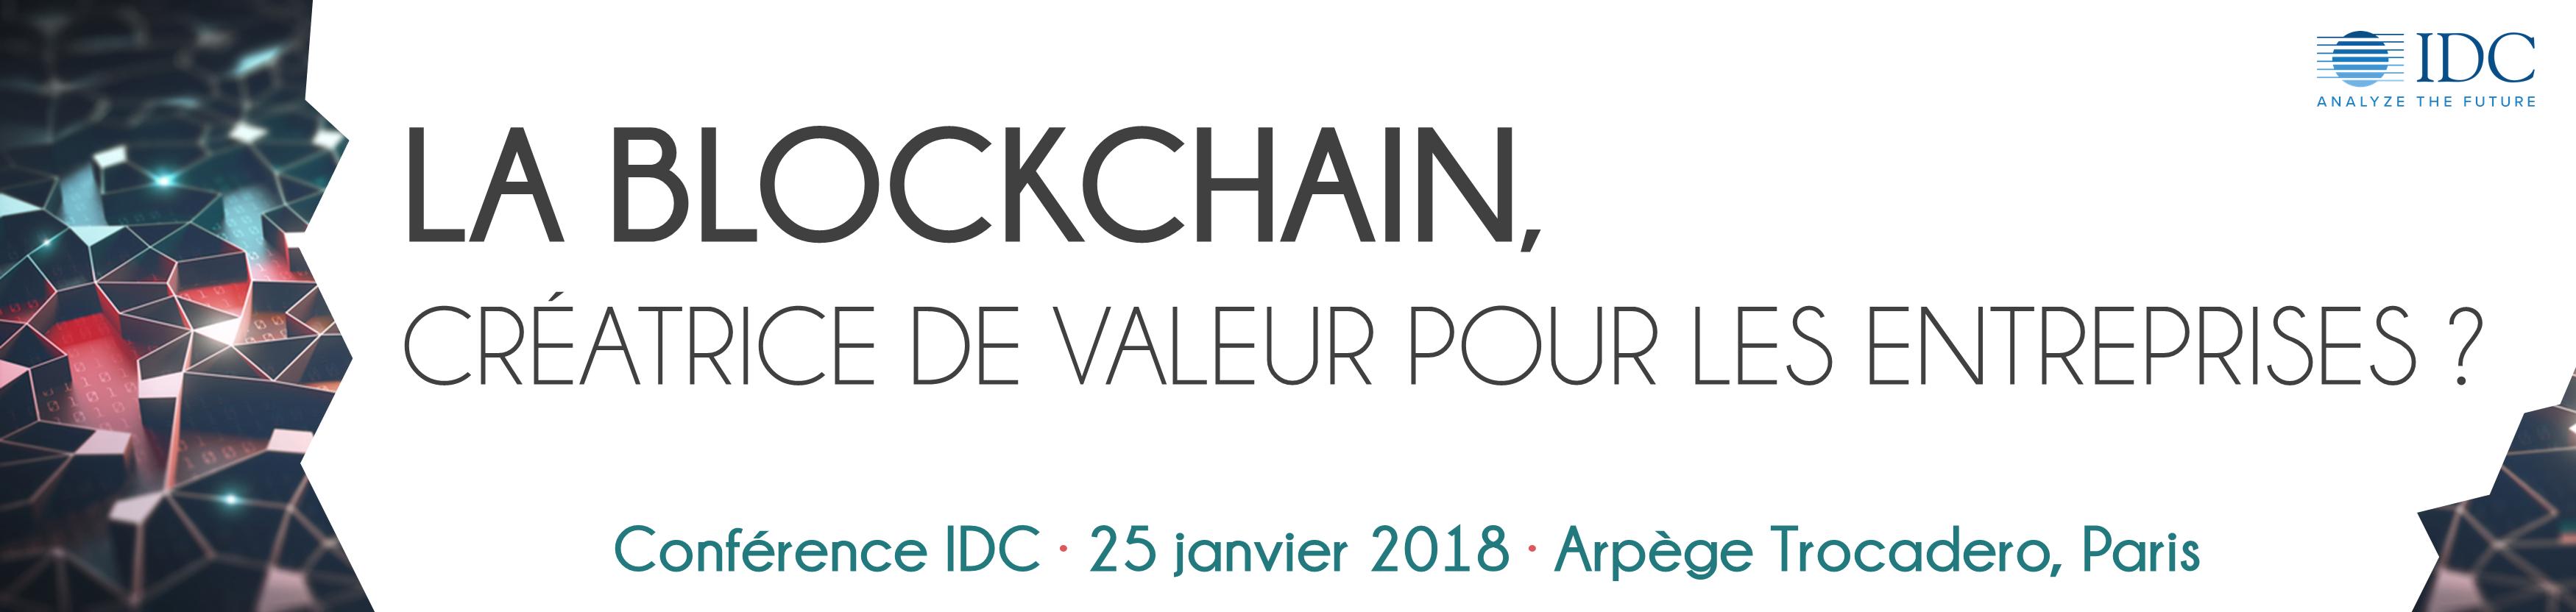 Conférence IDC Blockchain - 25 janvier